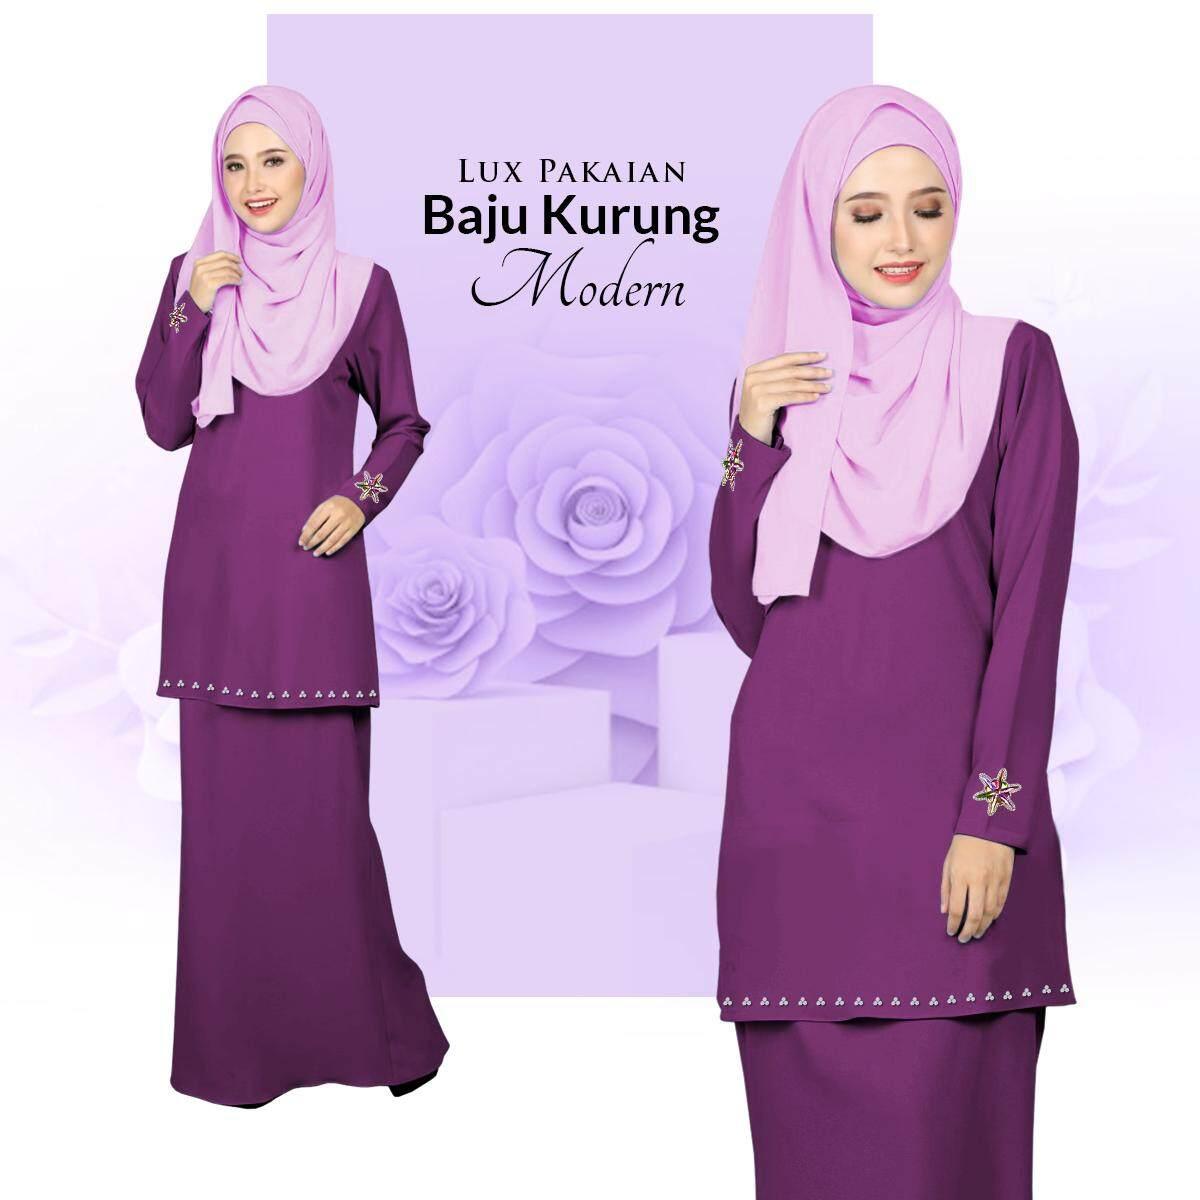 Harga Lux Pakaian Baju Kurung Modern with Stylish Bunch & Batu Terbaik